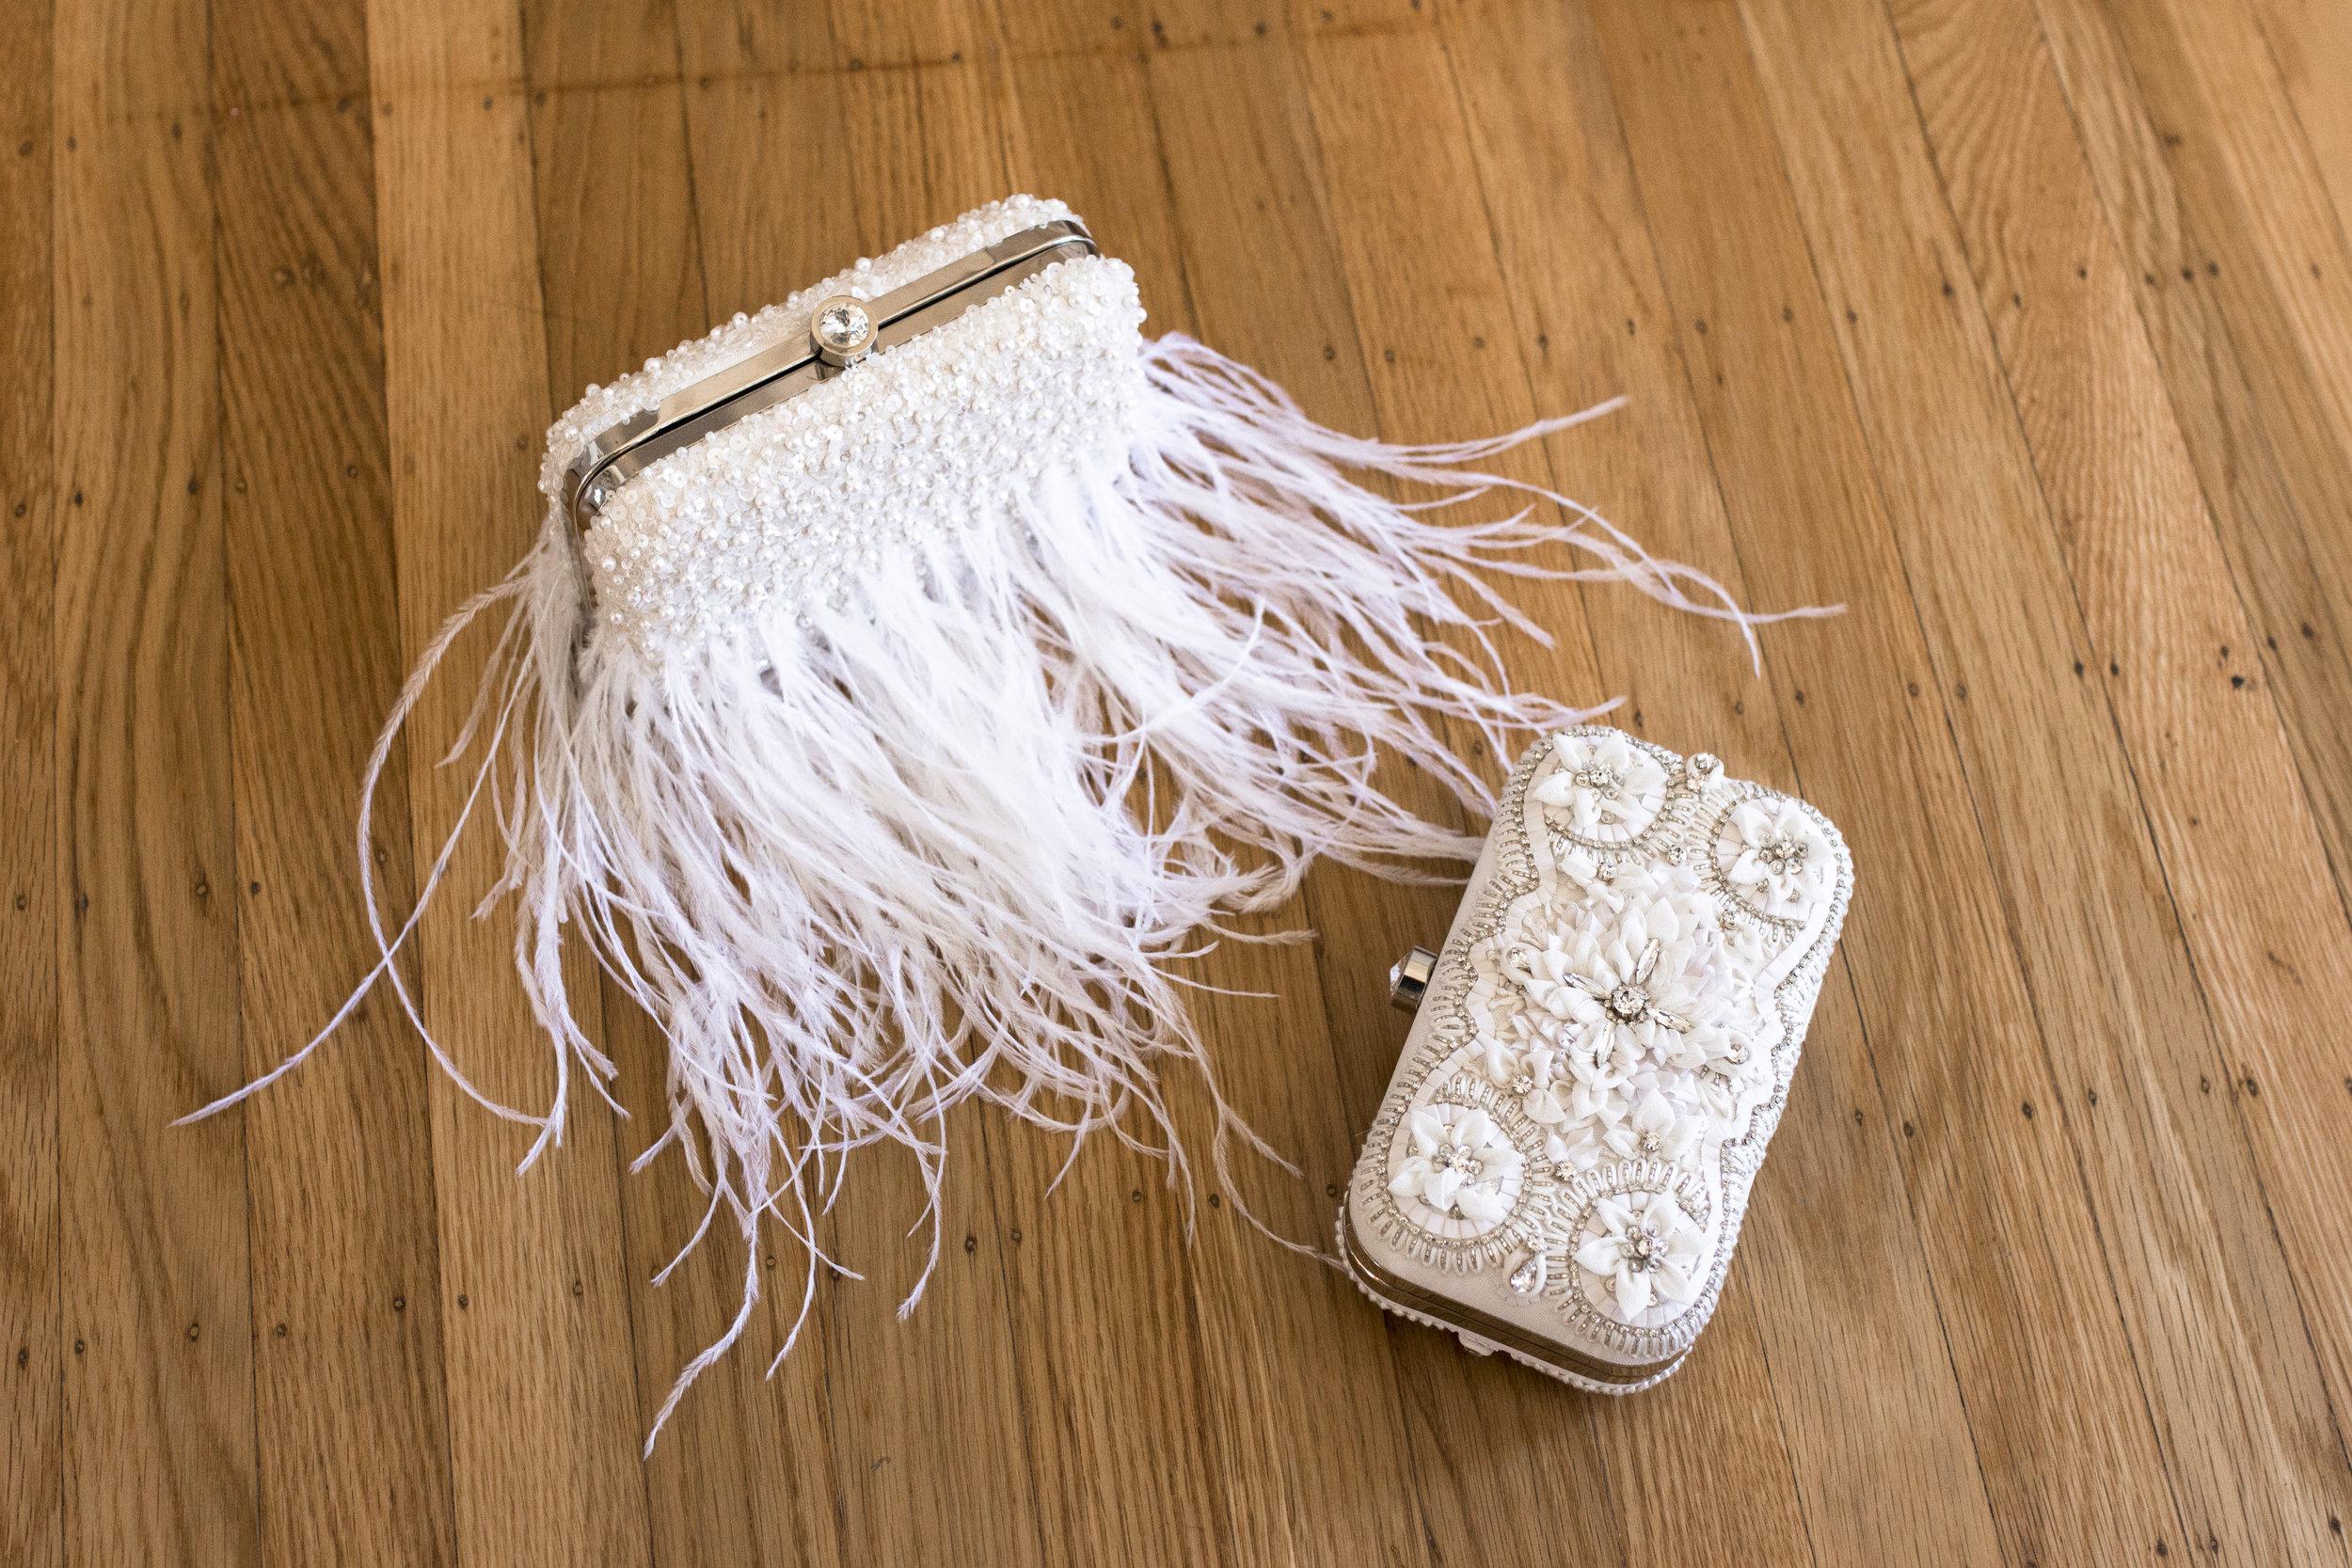 Evening wear clutch bags | Wine Country Bride Boutique | Bridal Shop in Santa Rosa